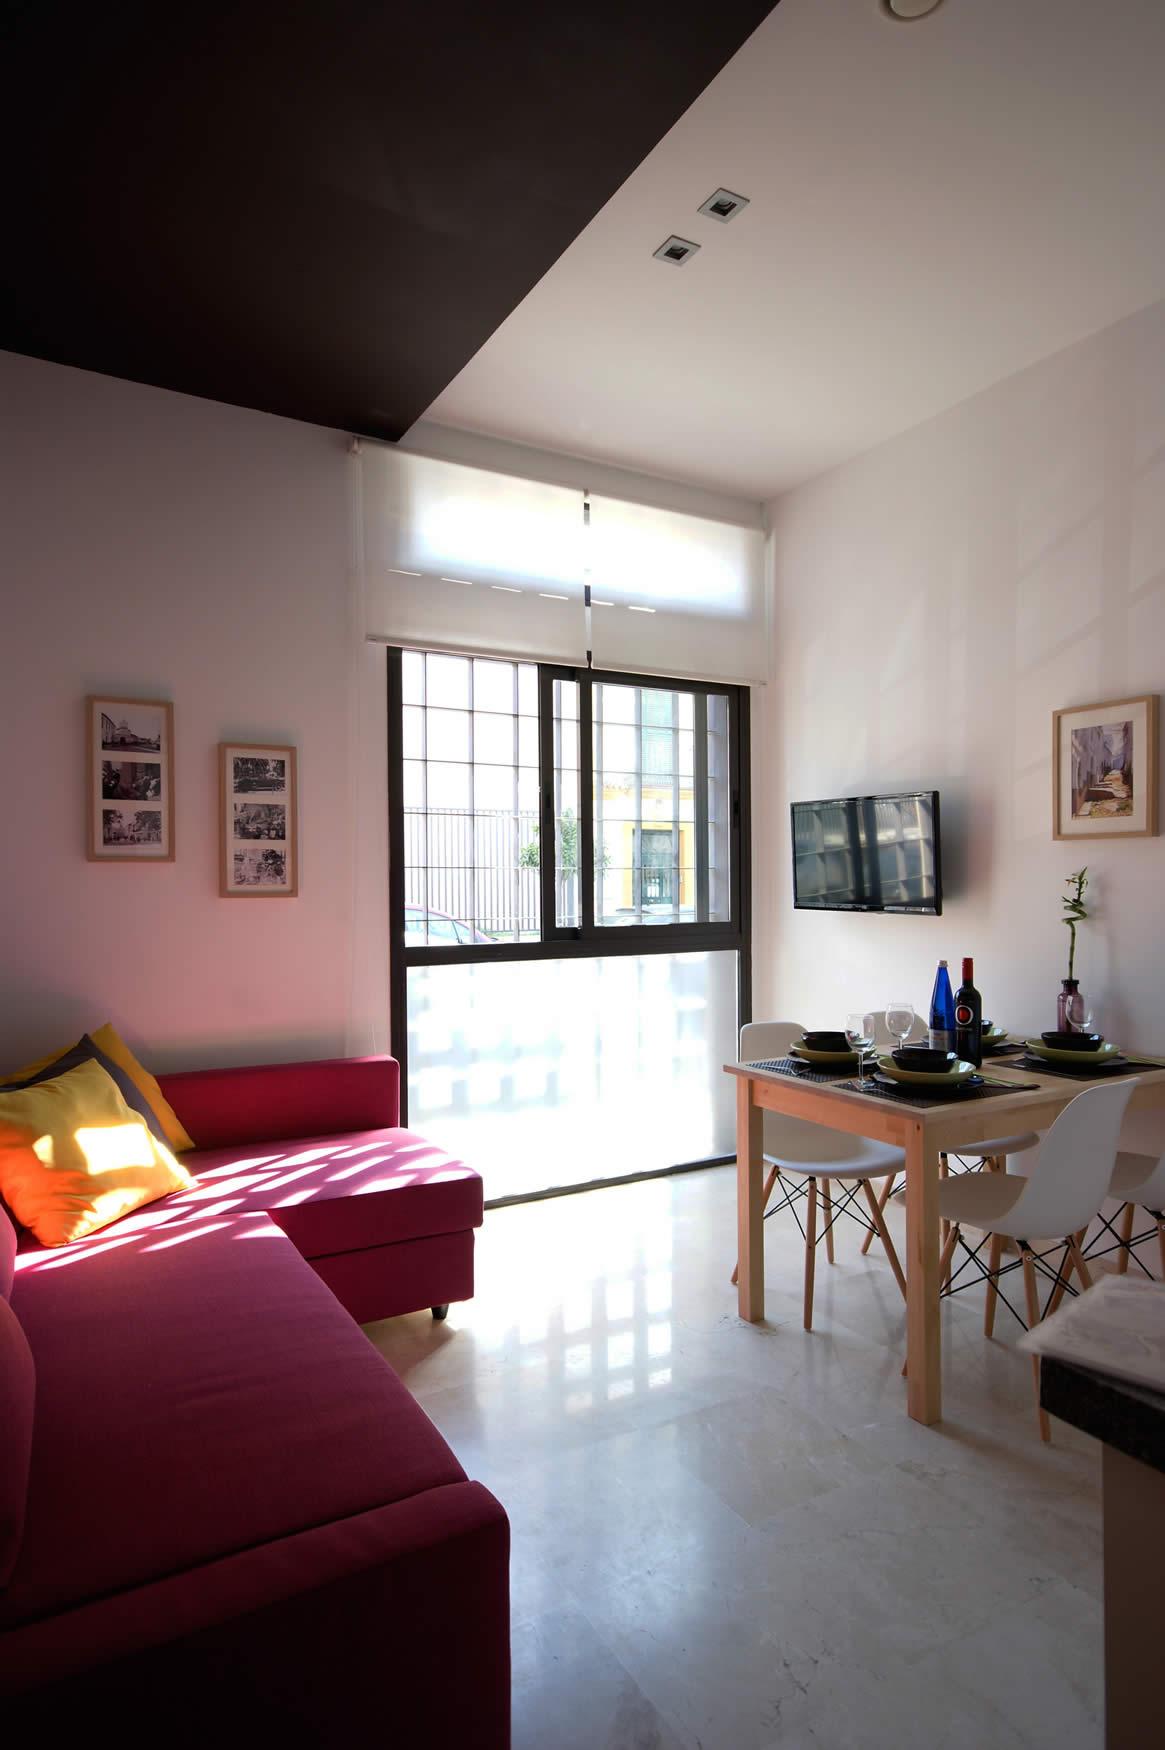 Apartamento en m laga centro loft minimal puntoapart - Apartamento vacacional malaga ...